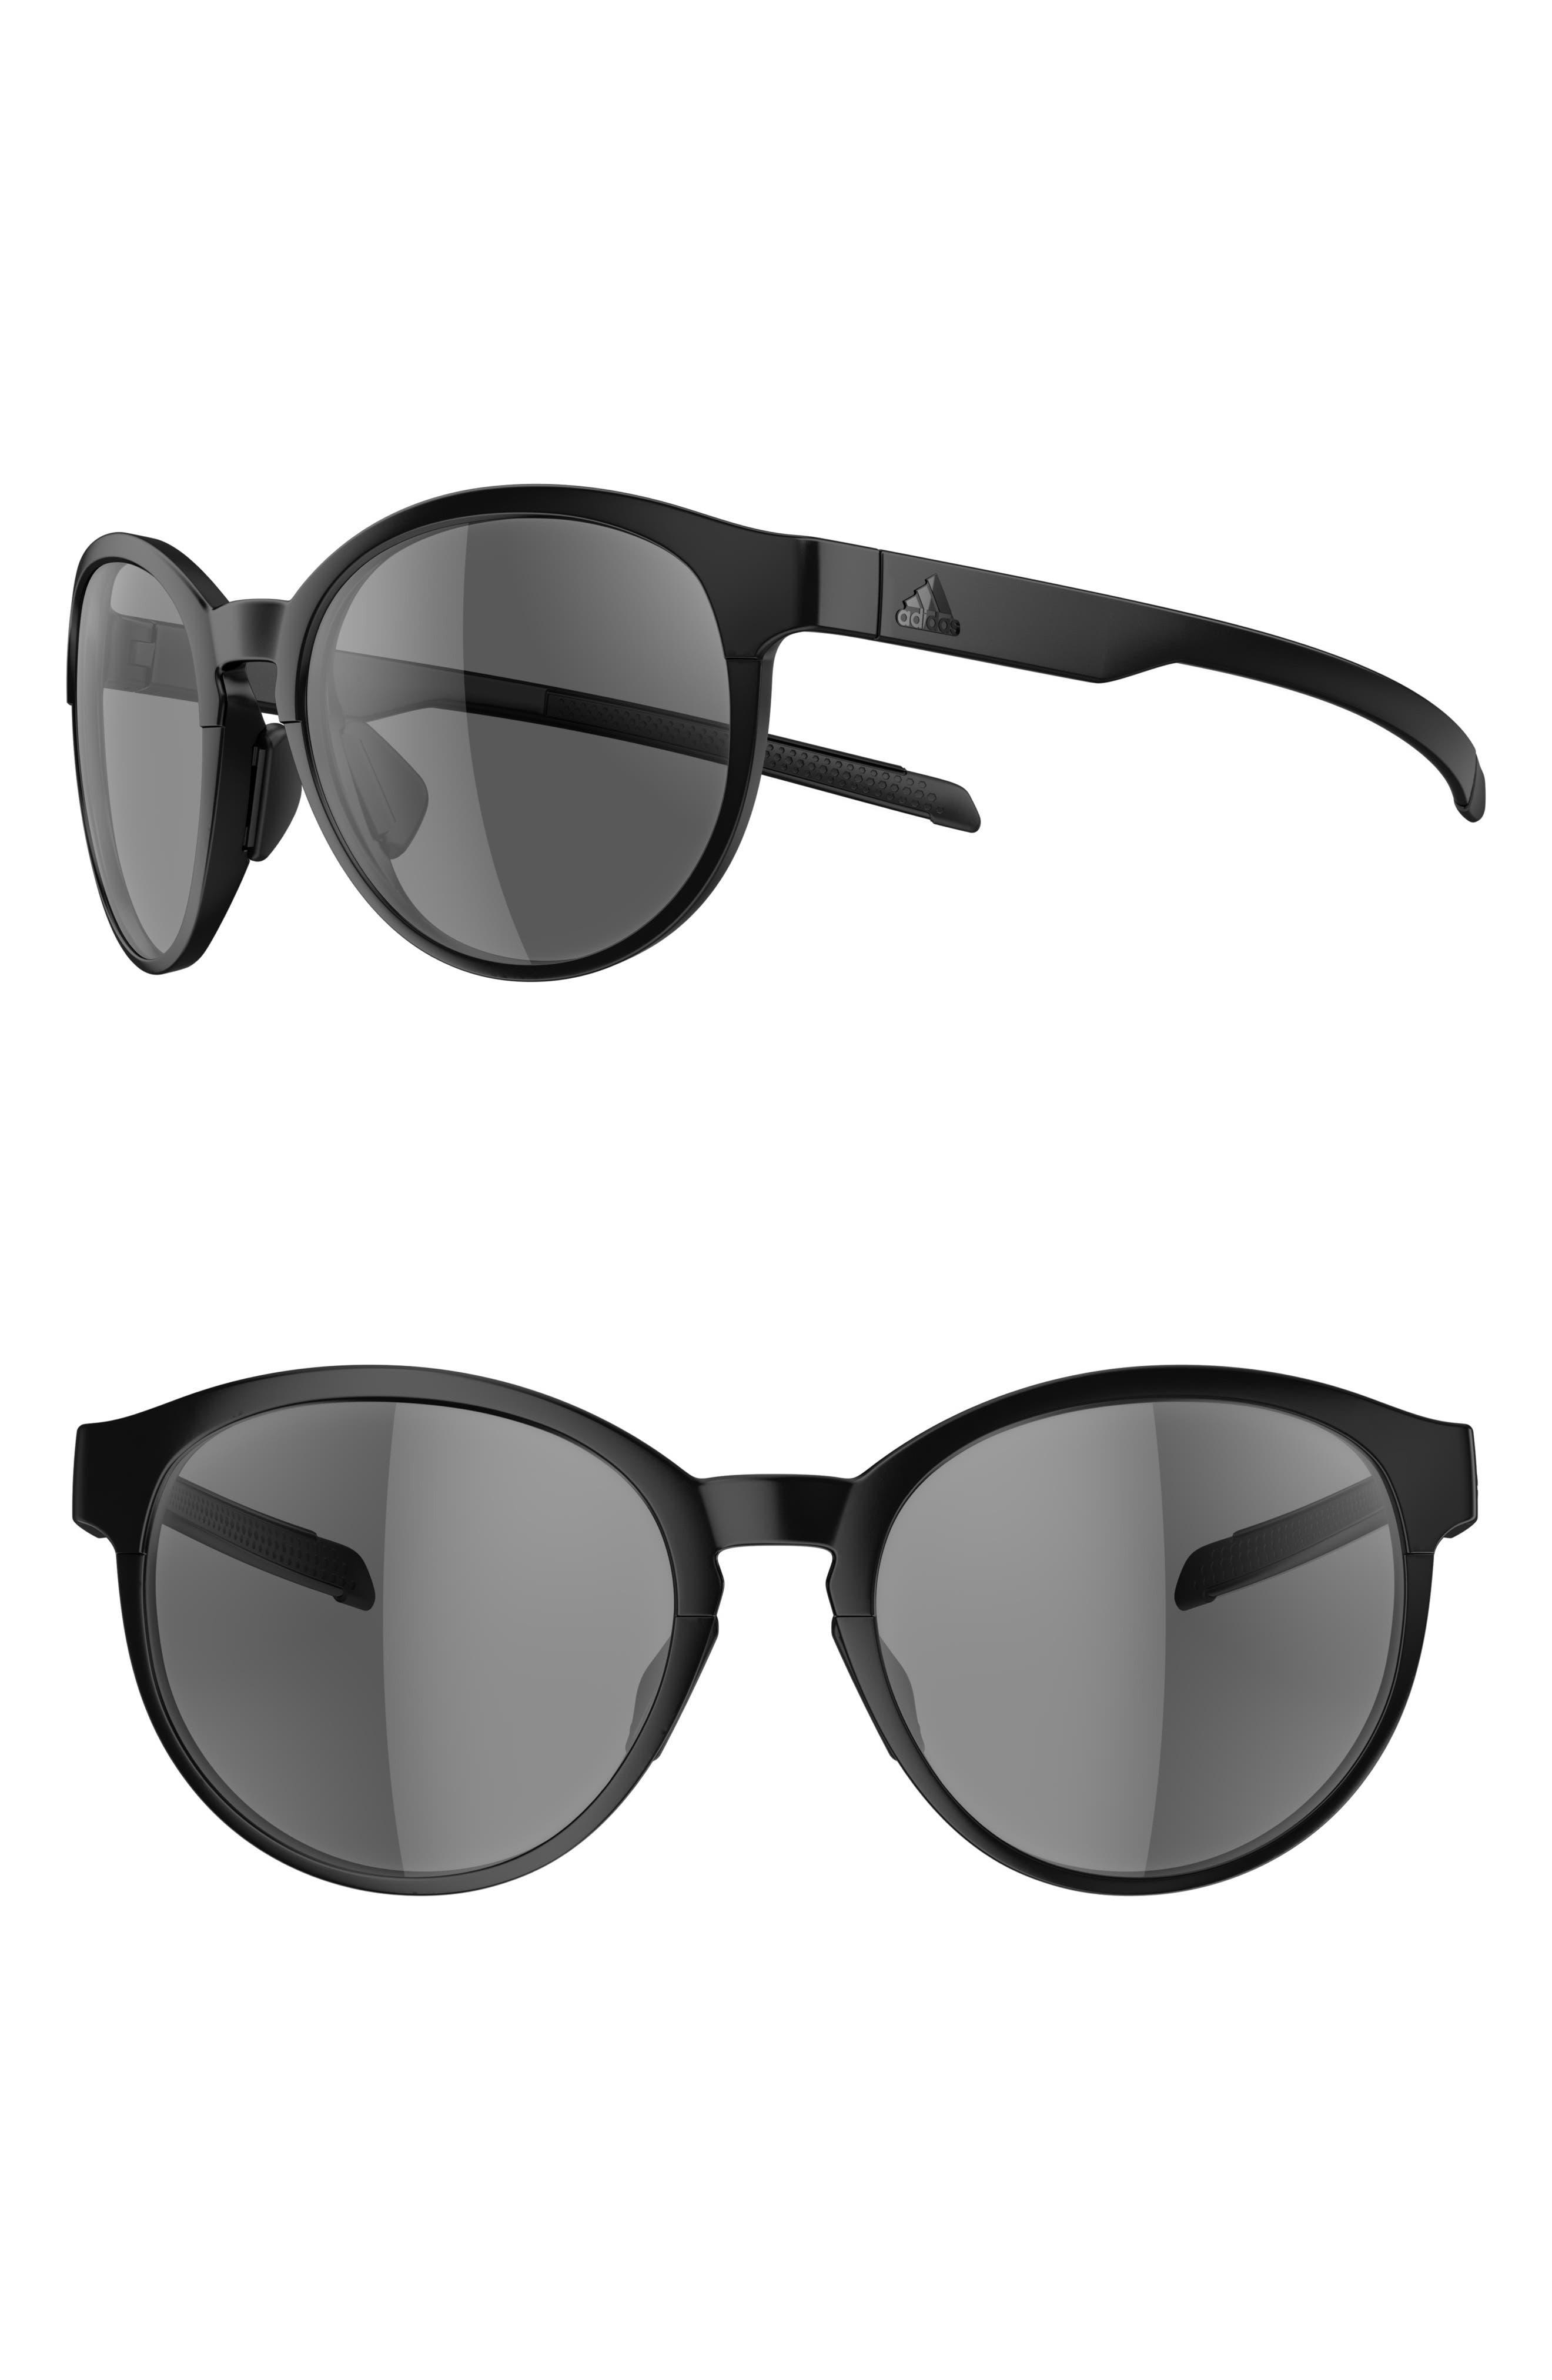 Beyonder 55mm Training Sunglasses,                             Main thumbnail 1, color,                             BLACK MATTE/ GREY